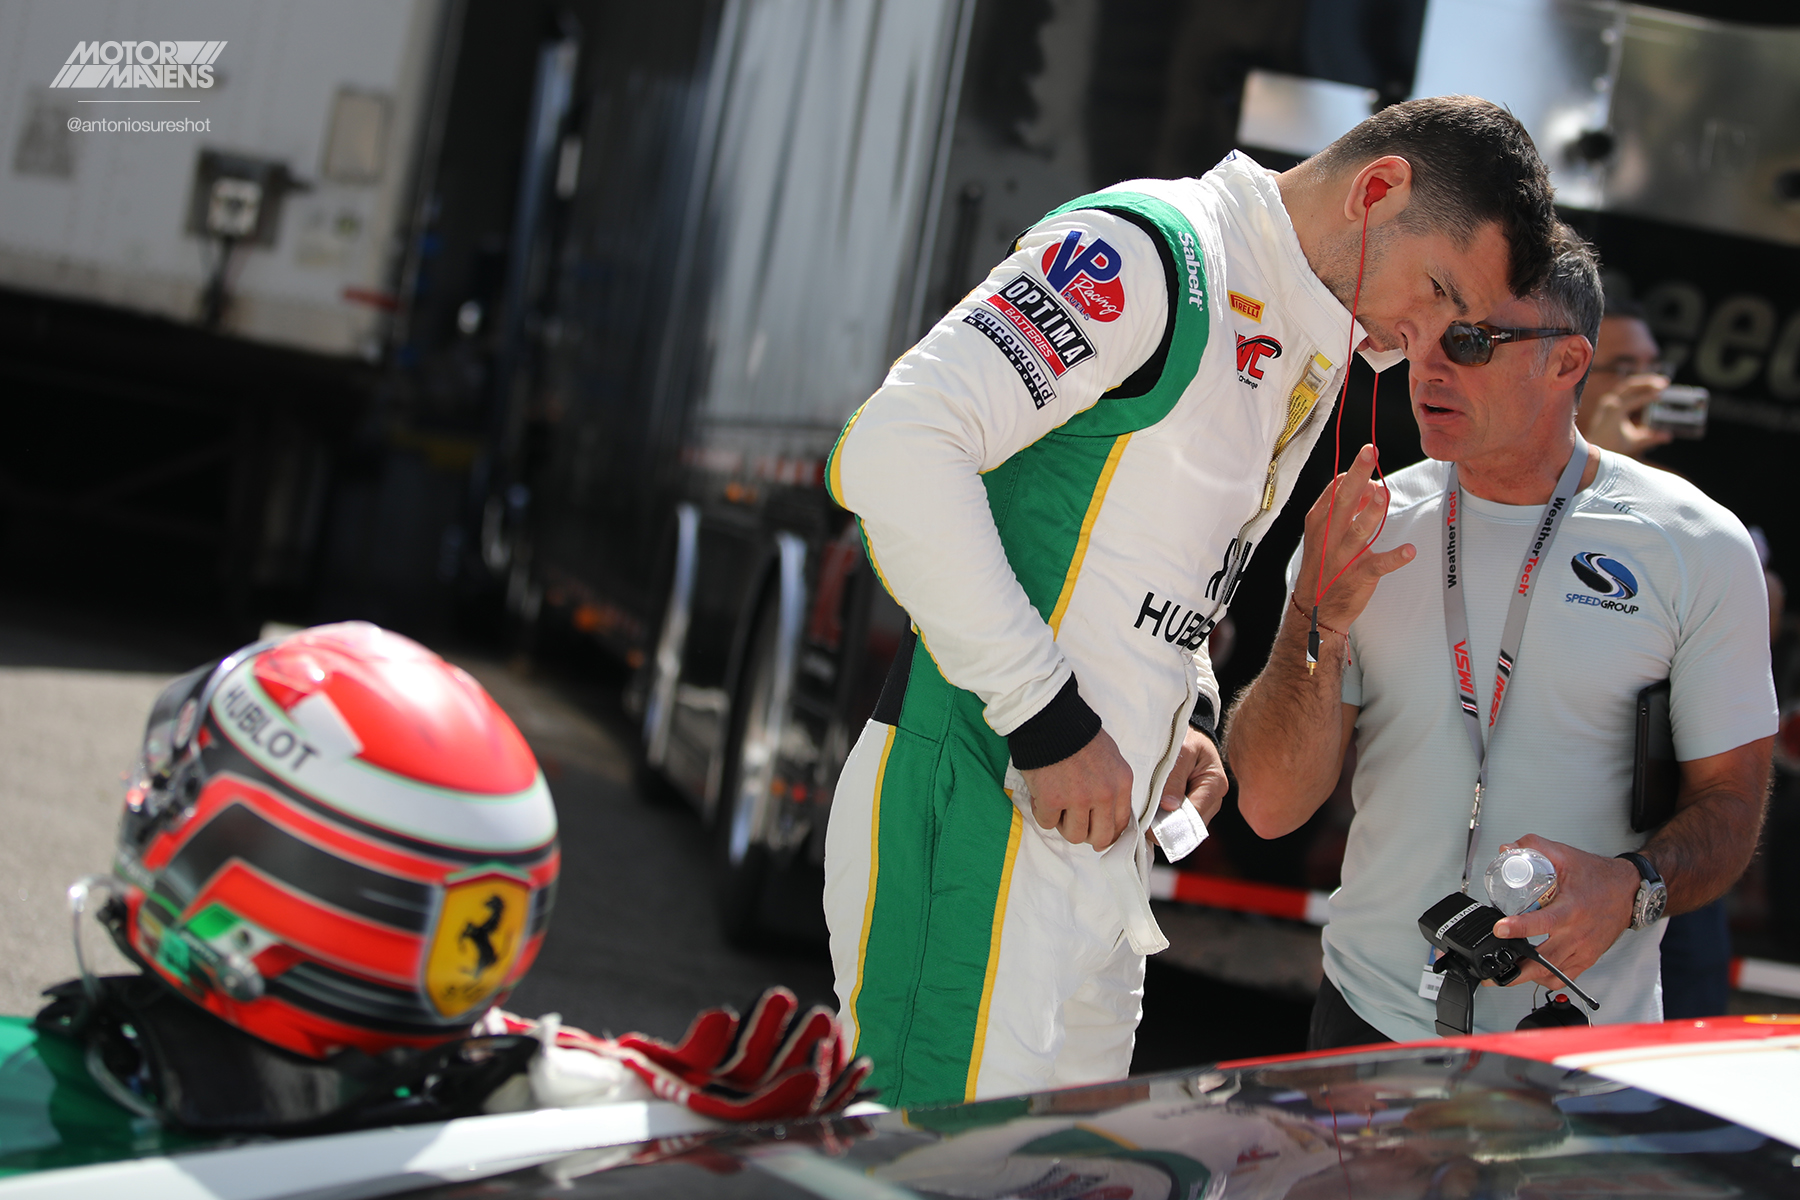 Ferrari, Ferrari 488, Ferrari 488 GT3, Pirelli World Challenge, Long Beach Grand Prix, Martin Fuentes, Hublot